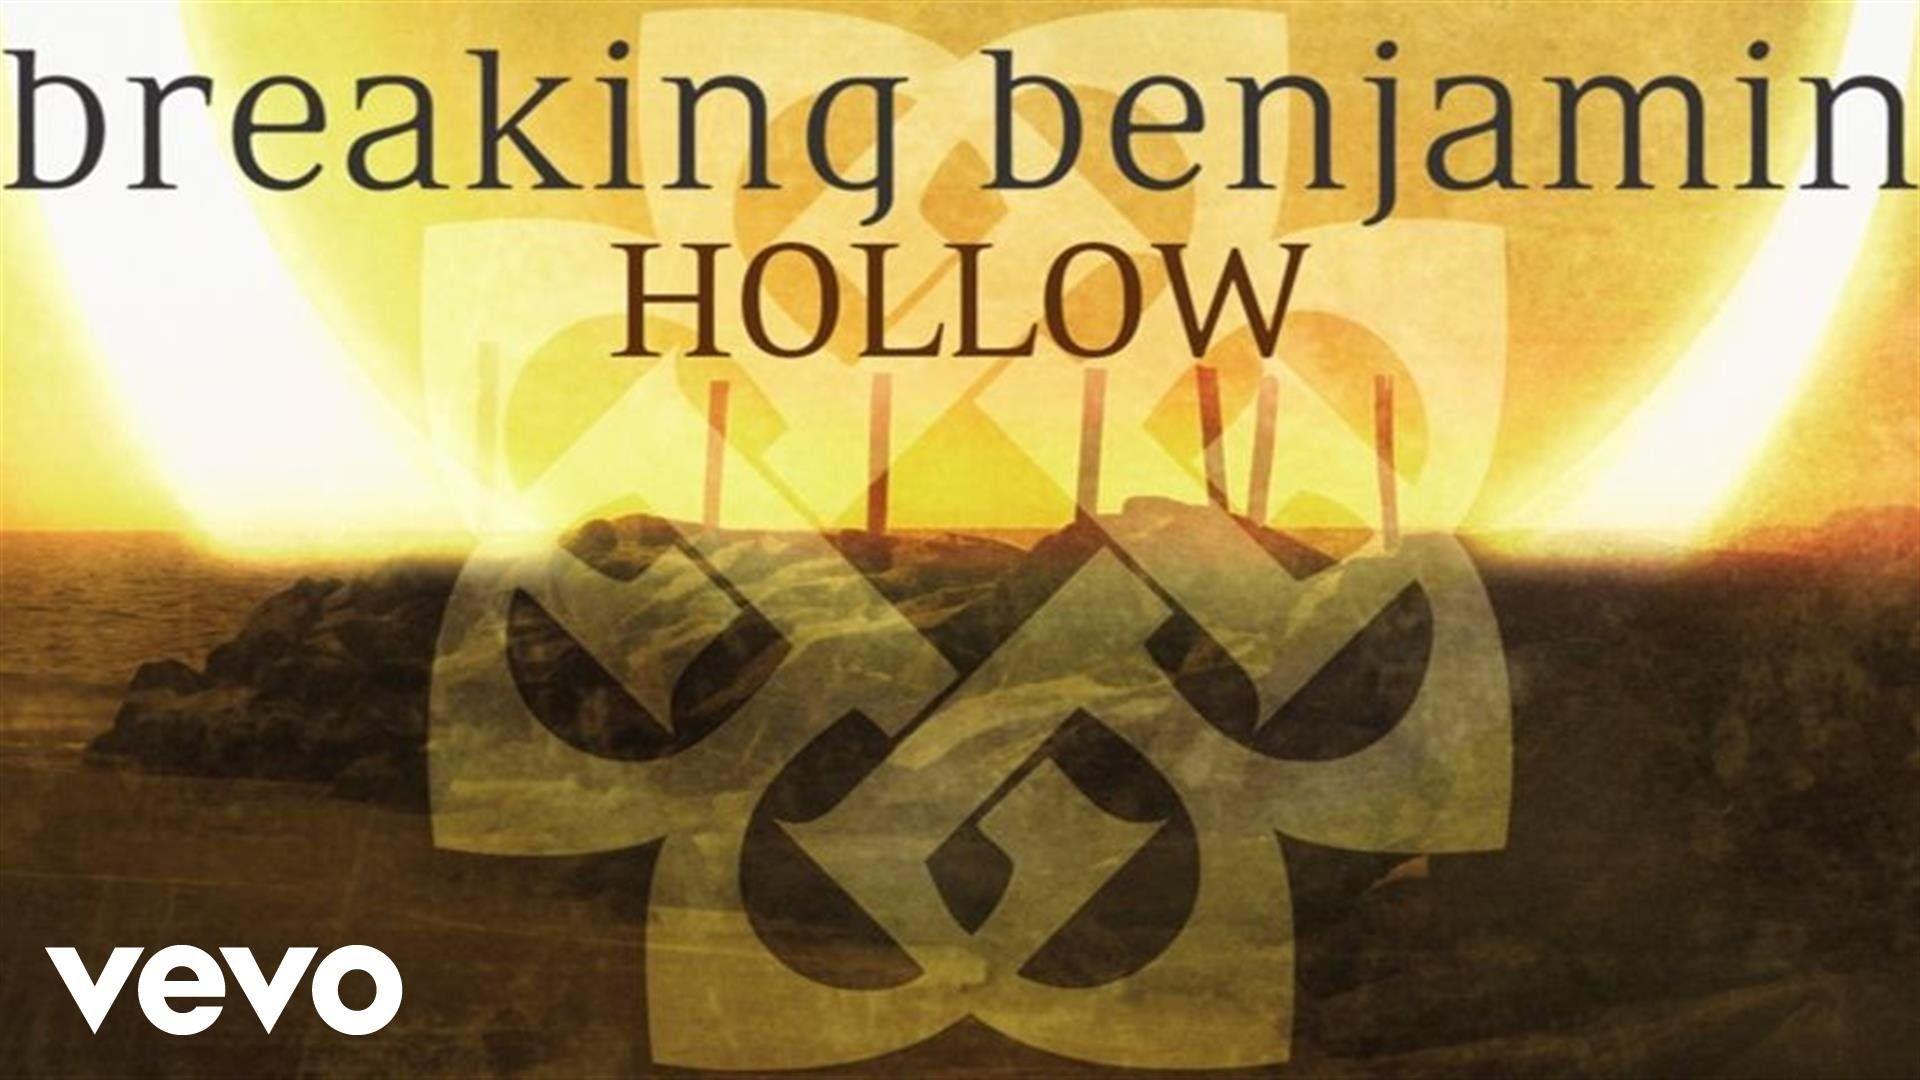 Breaking Benjamin Hollow Audio Only Breaking Benjamin Benjamin Vevo